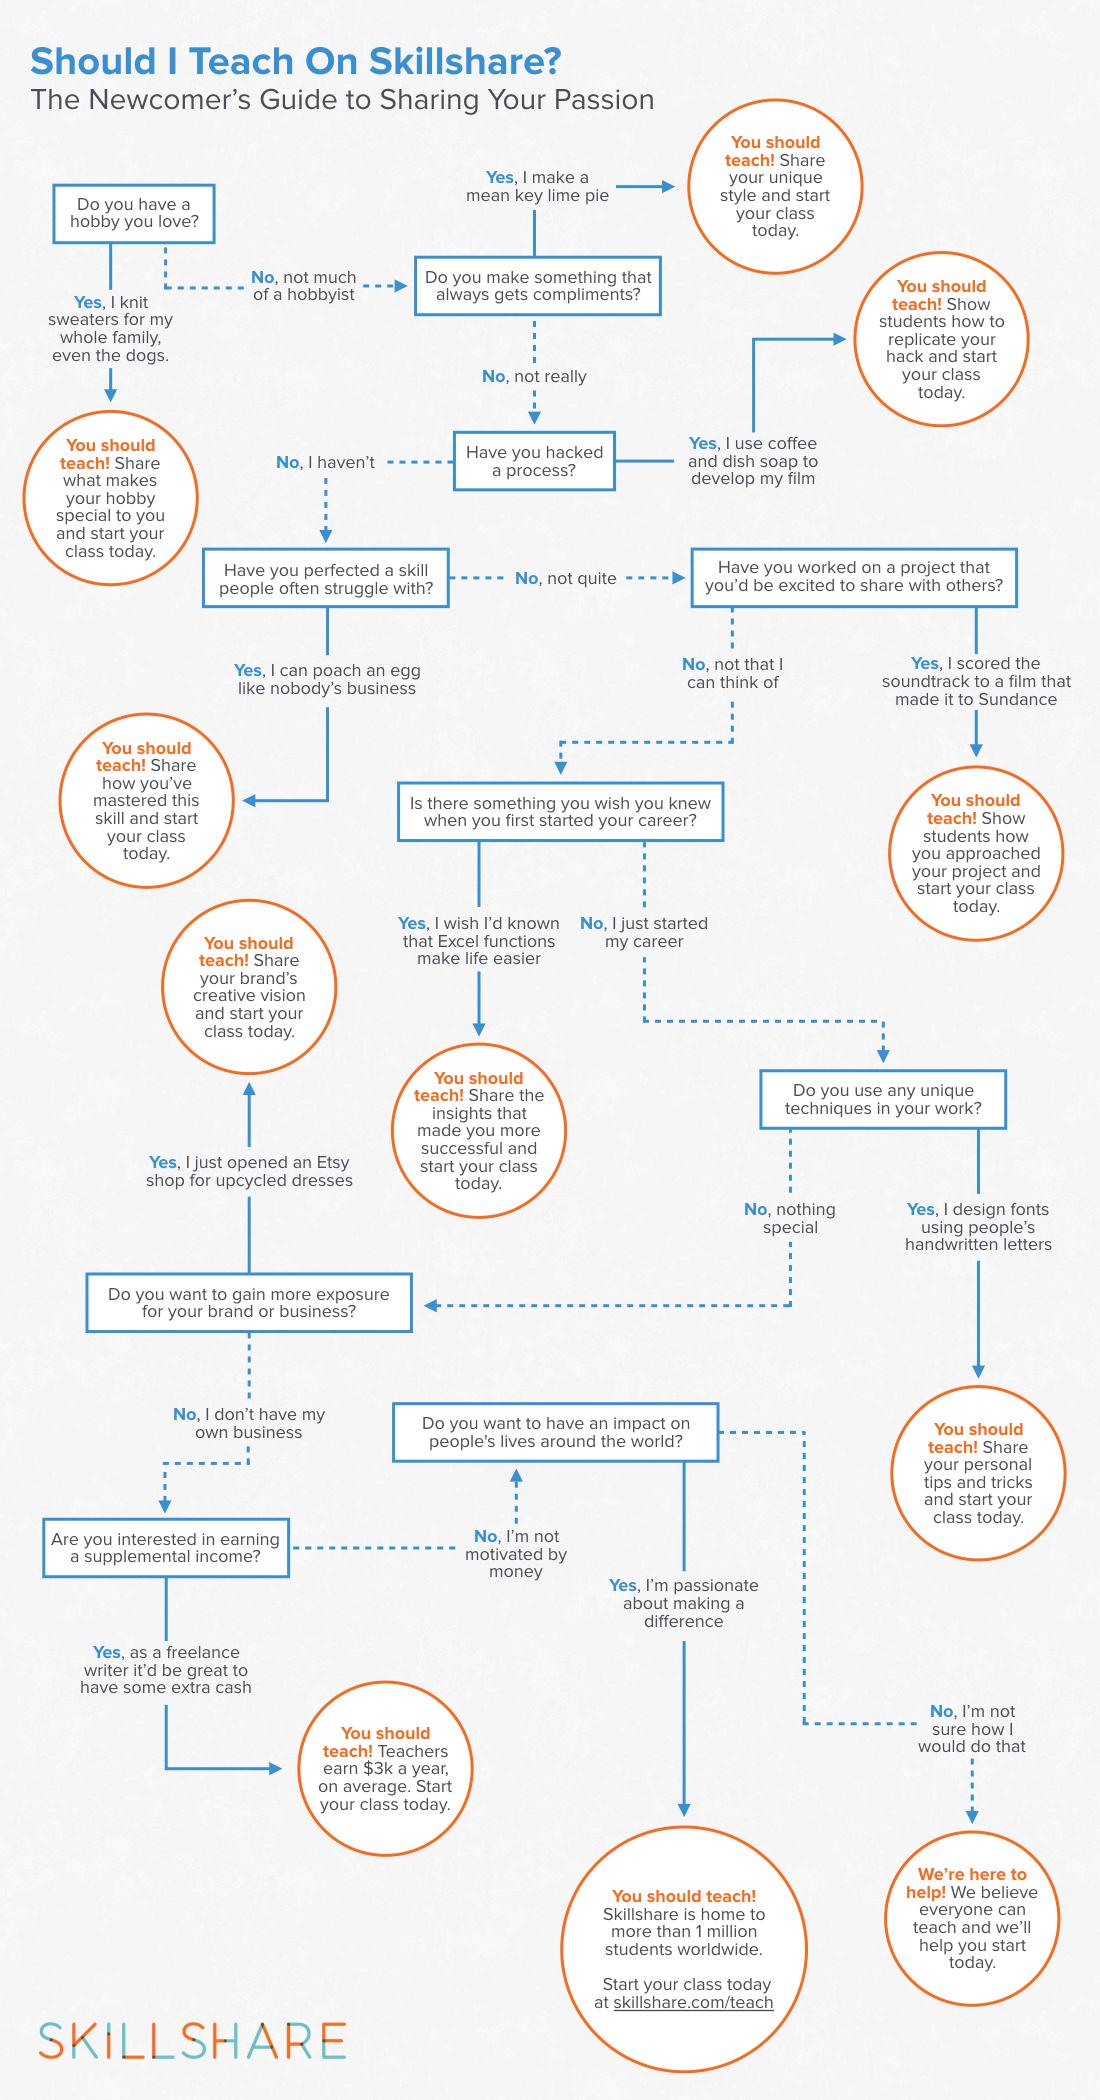 Should I Teach on Skillshare infographic